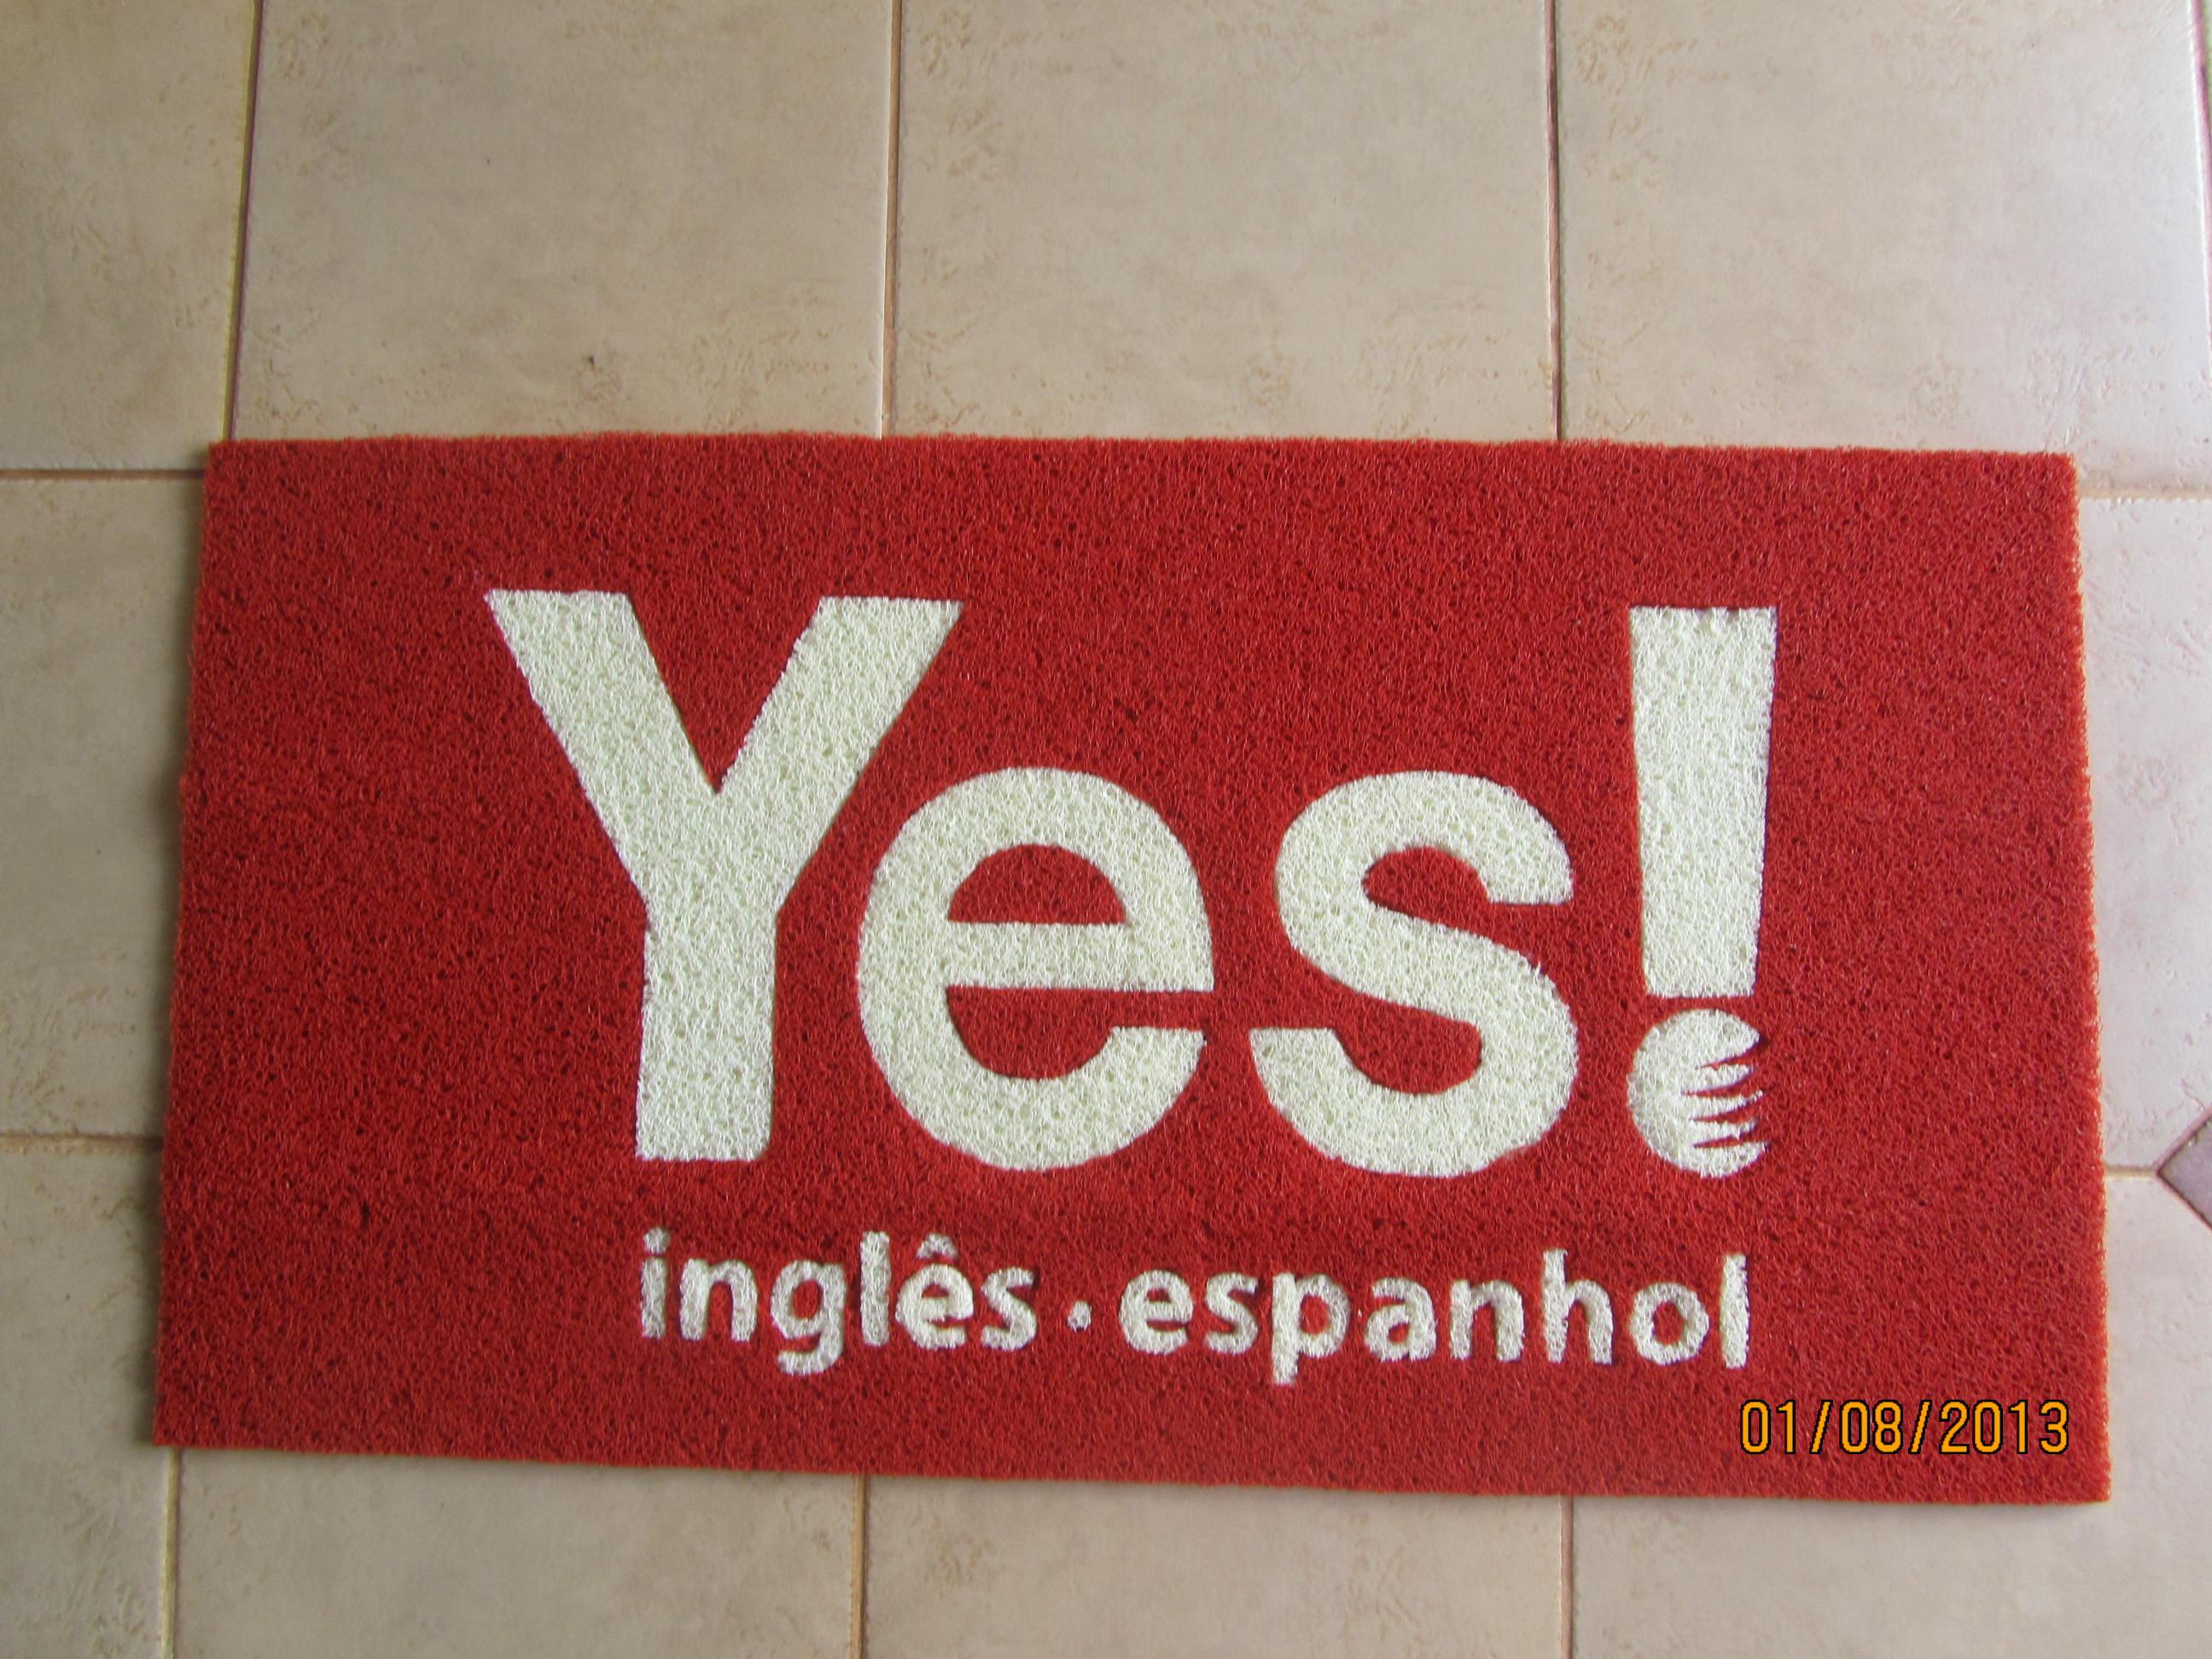 Yes Inglês e Espanhol